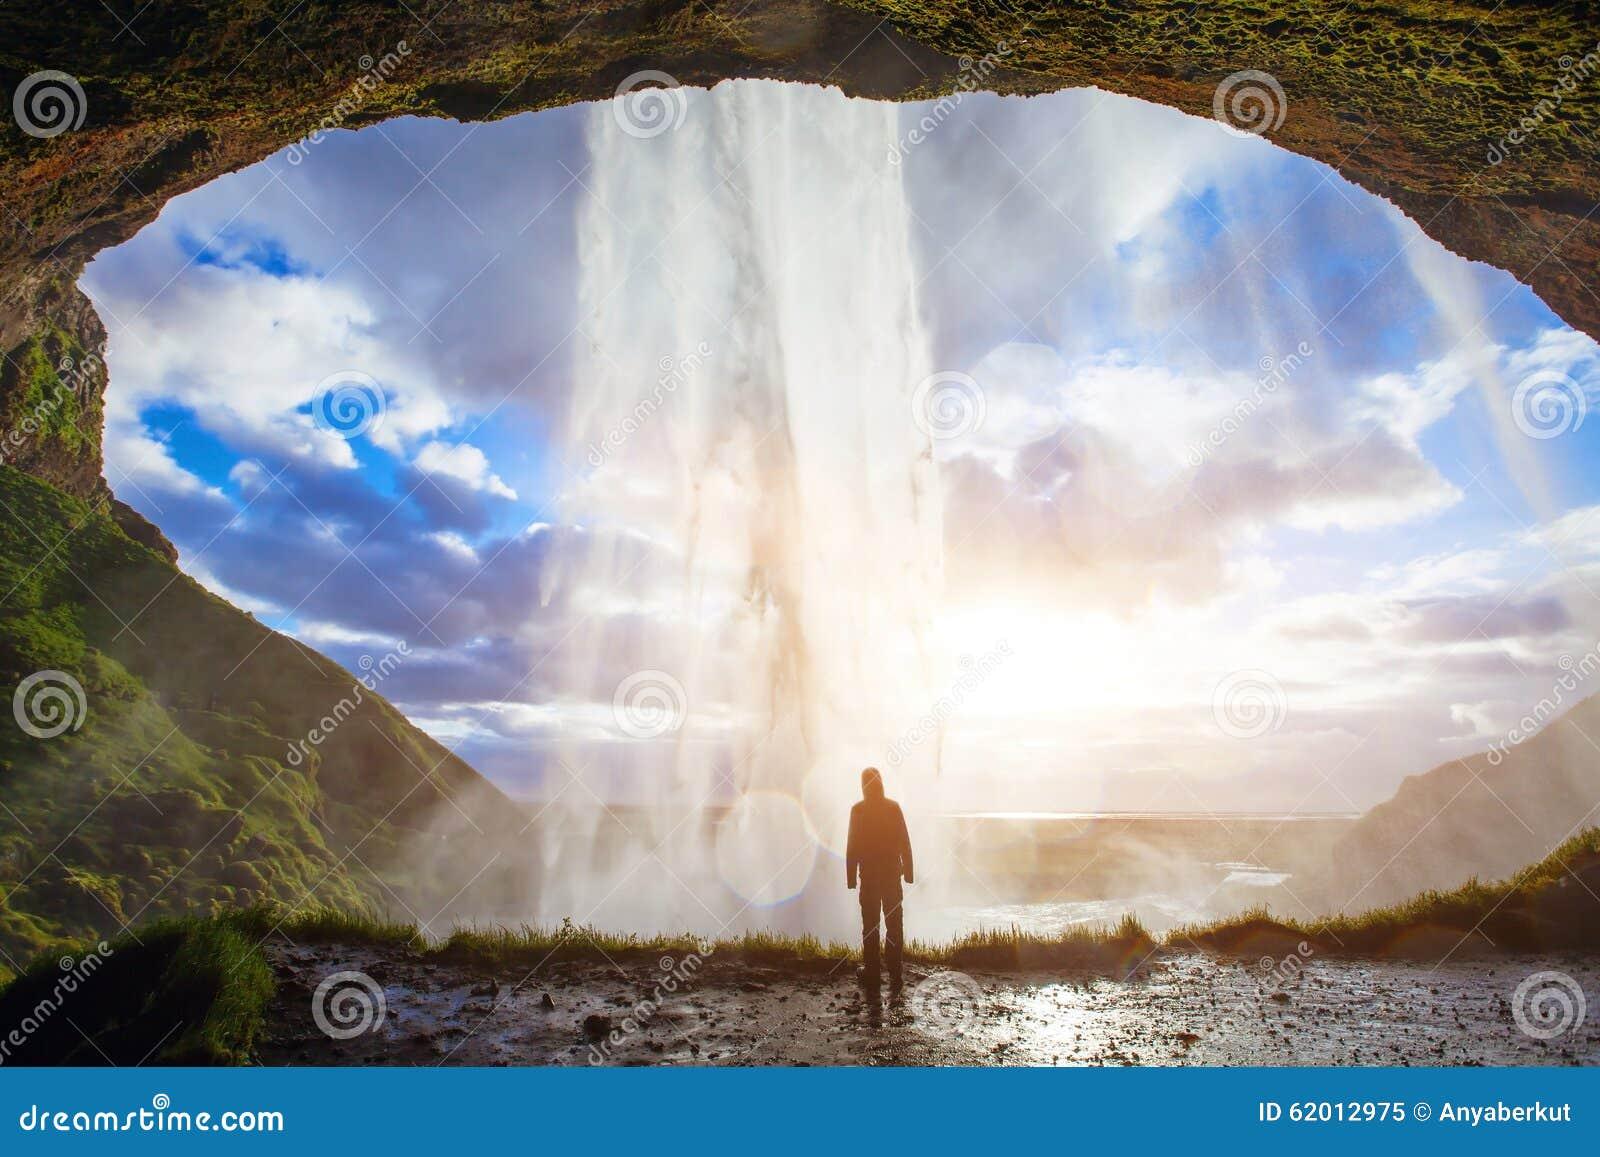 Nature Images 2mb: Man Enjoying Amazing View Of Nature Stock Image